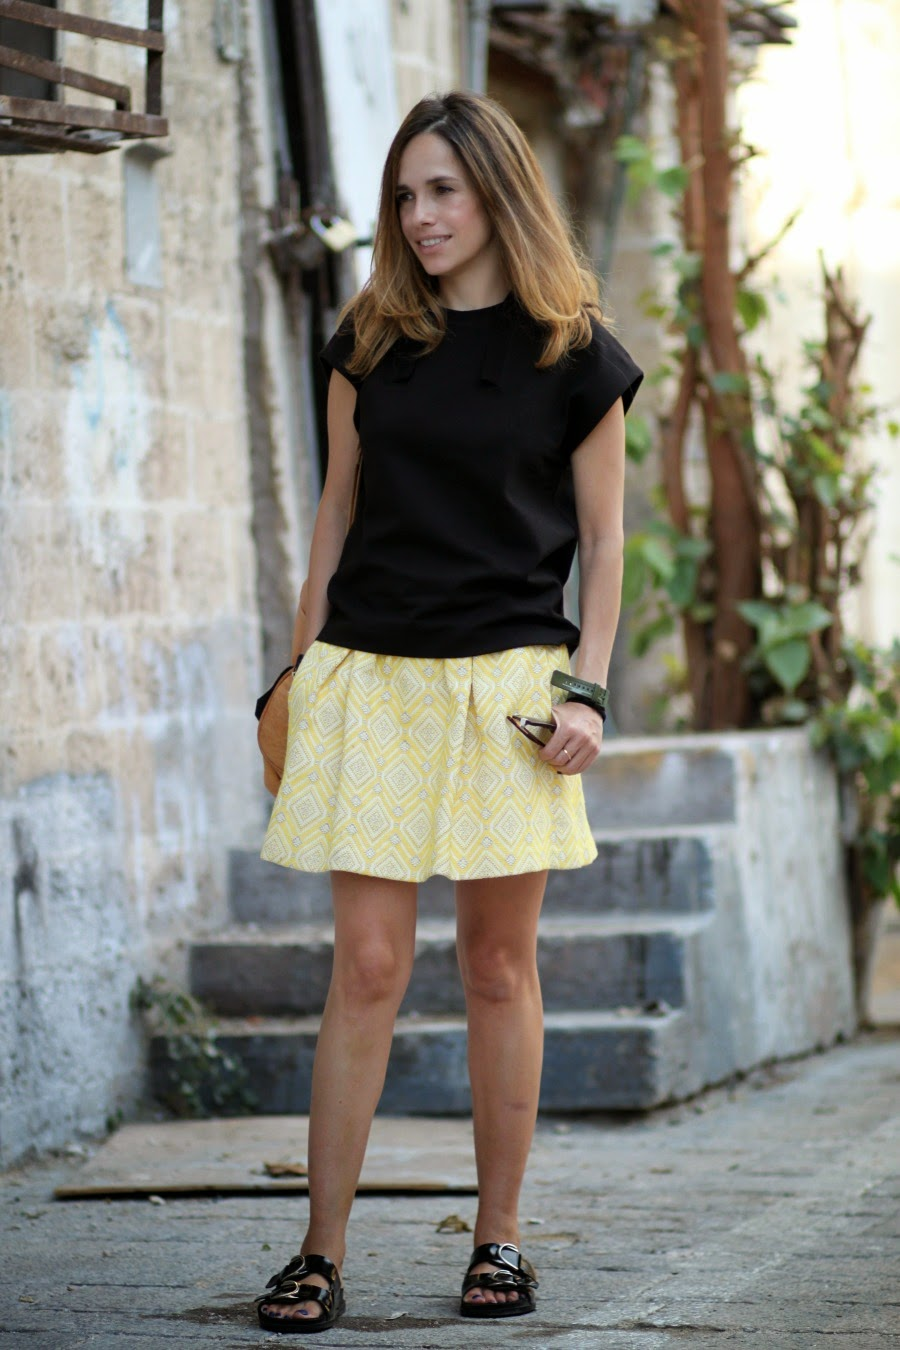 boldcolor, telavivstreetstyle, yellow,skirt,outfit,match,look,pattern,fashioblog,אופנה, בלוגאופנה,